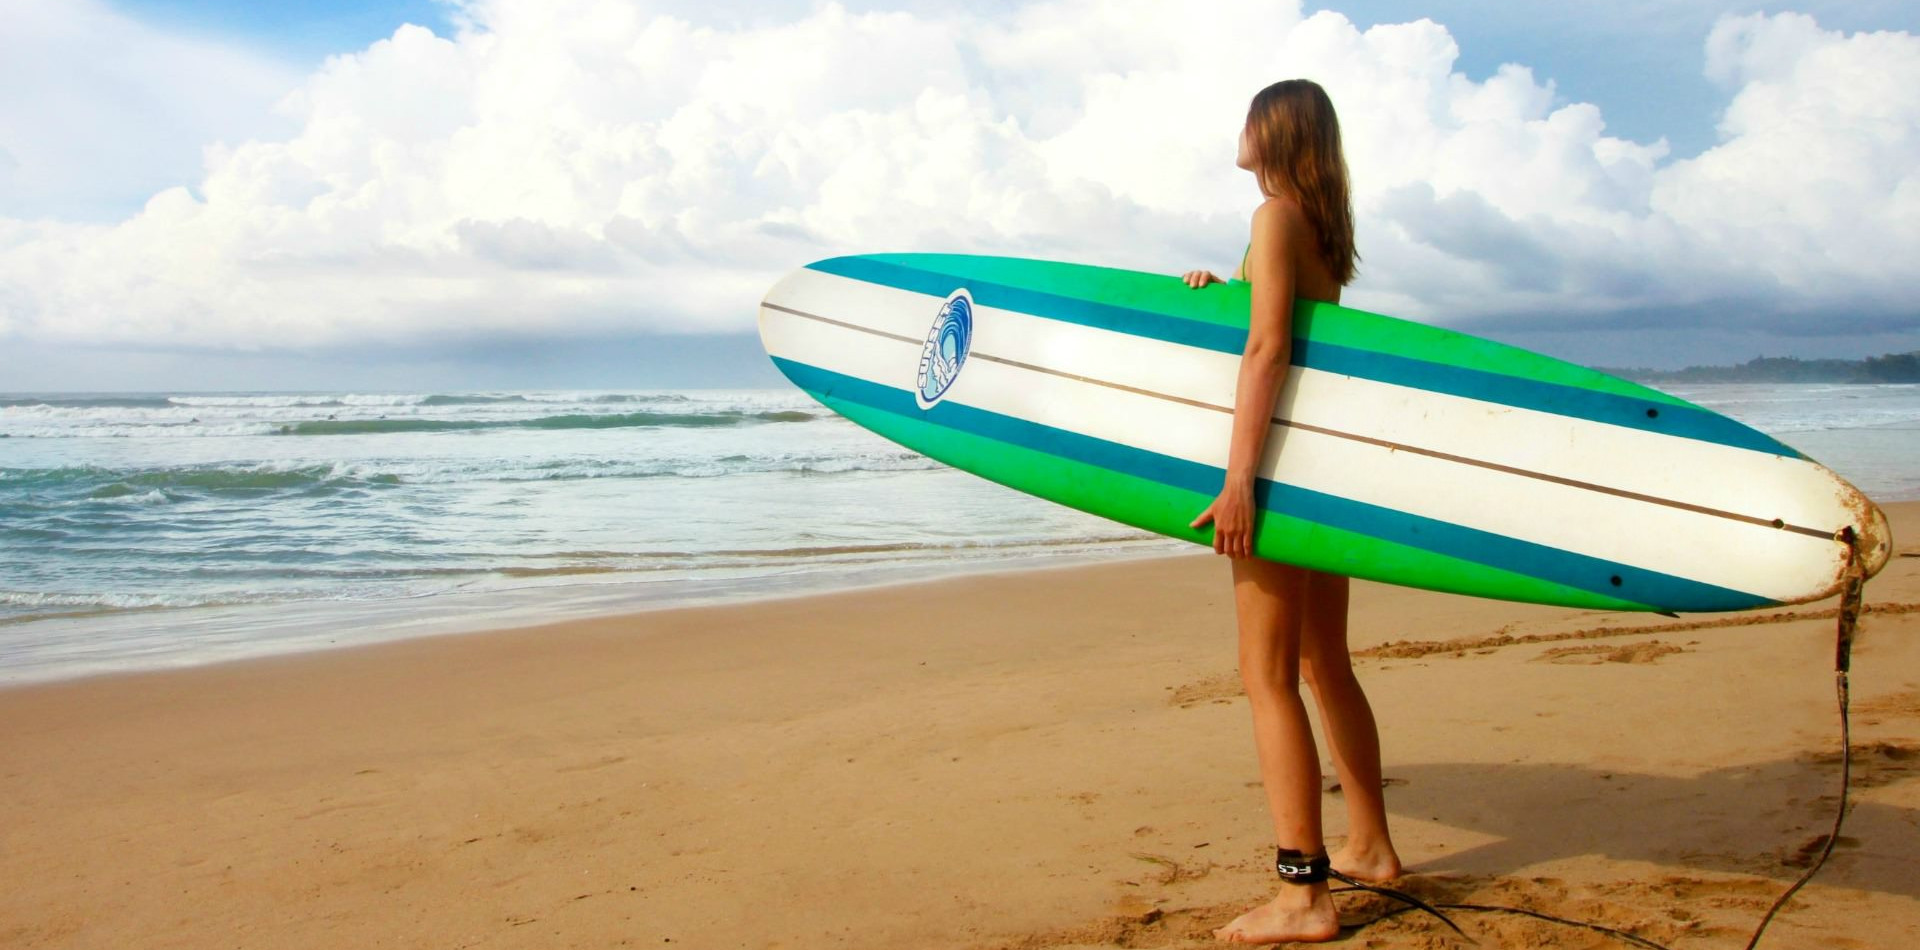 playa-surf-mujer.jpg